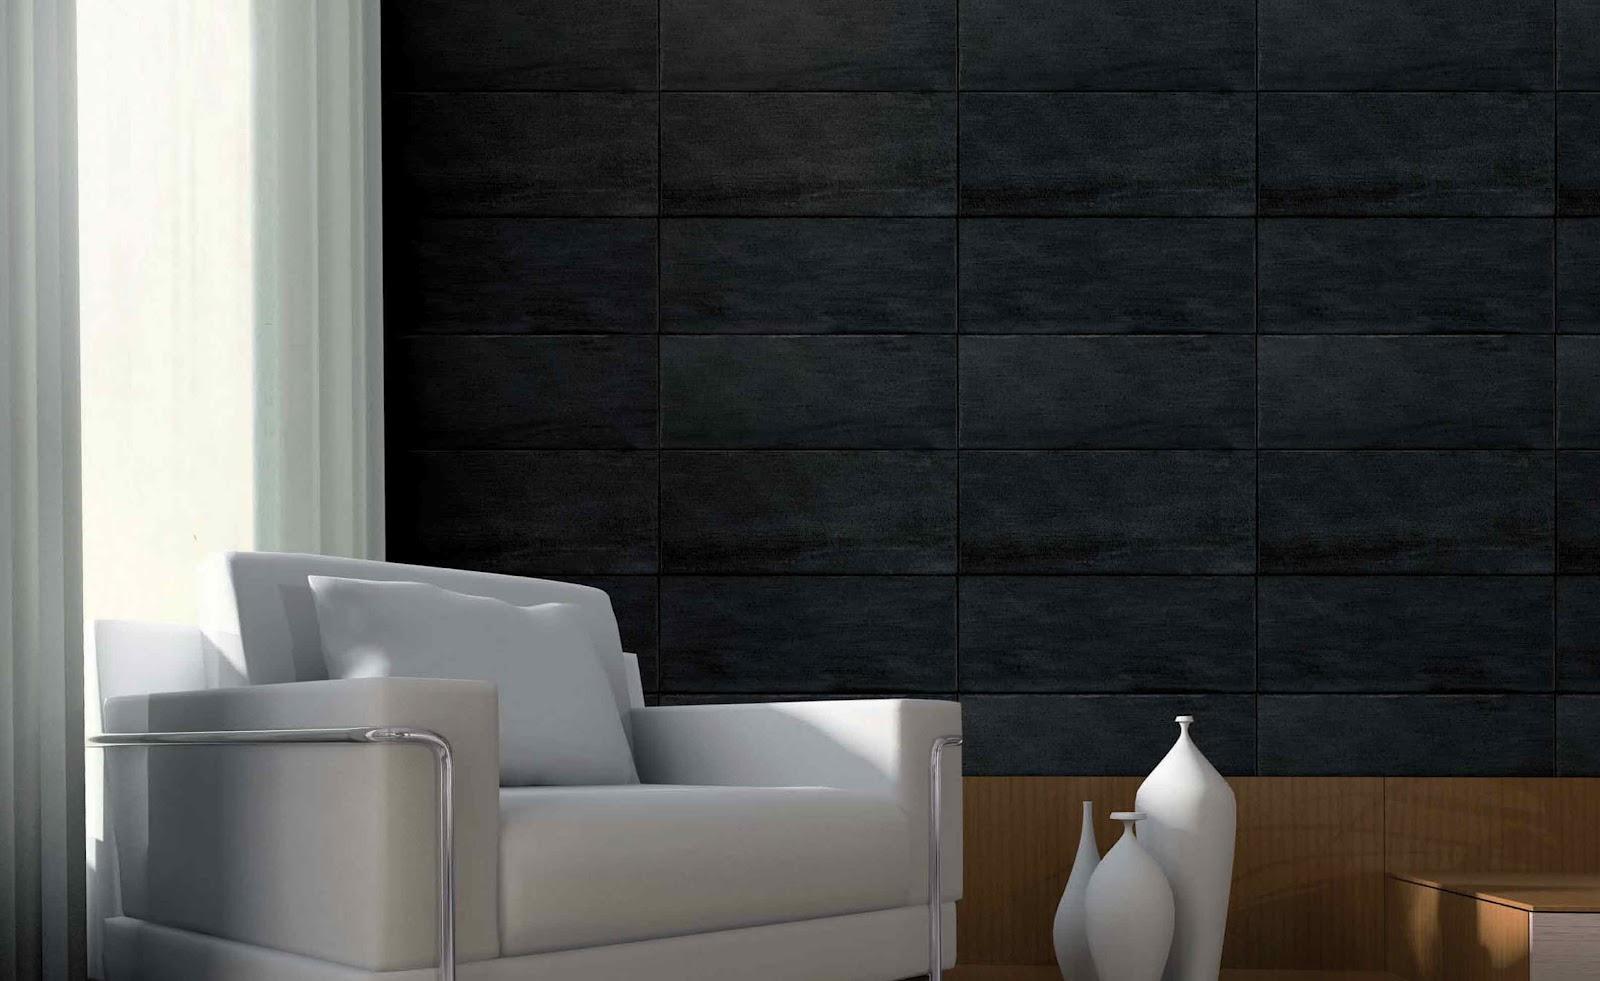 tapisserie autocollante pas cher. Black Bedroom Furniture Sets. Home Design Ideas